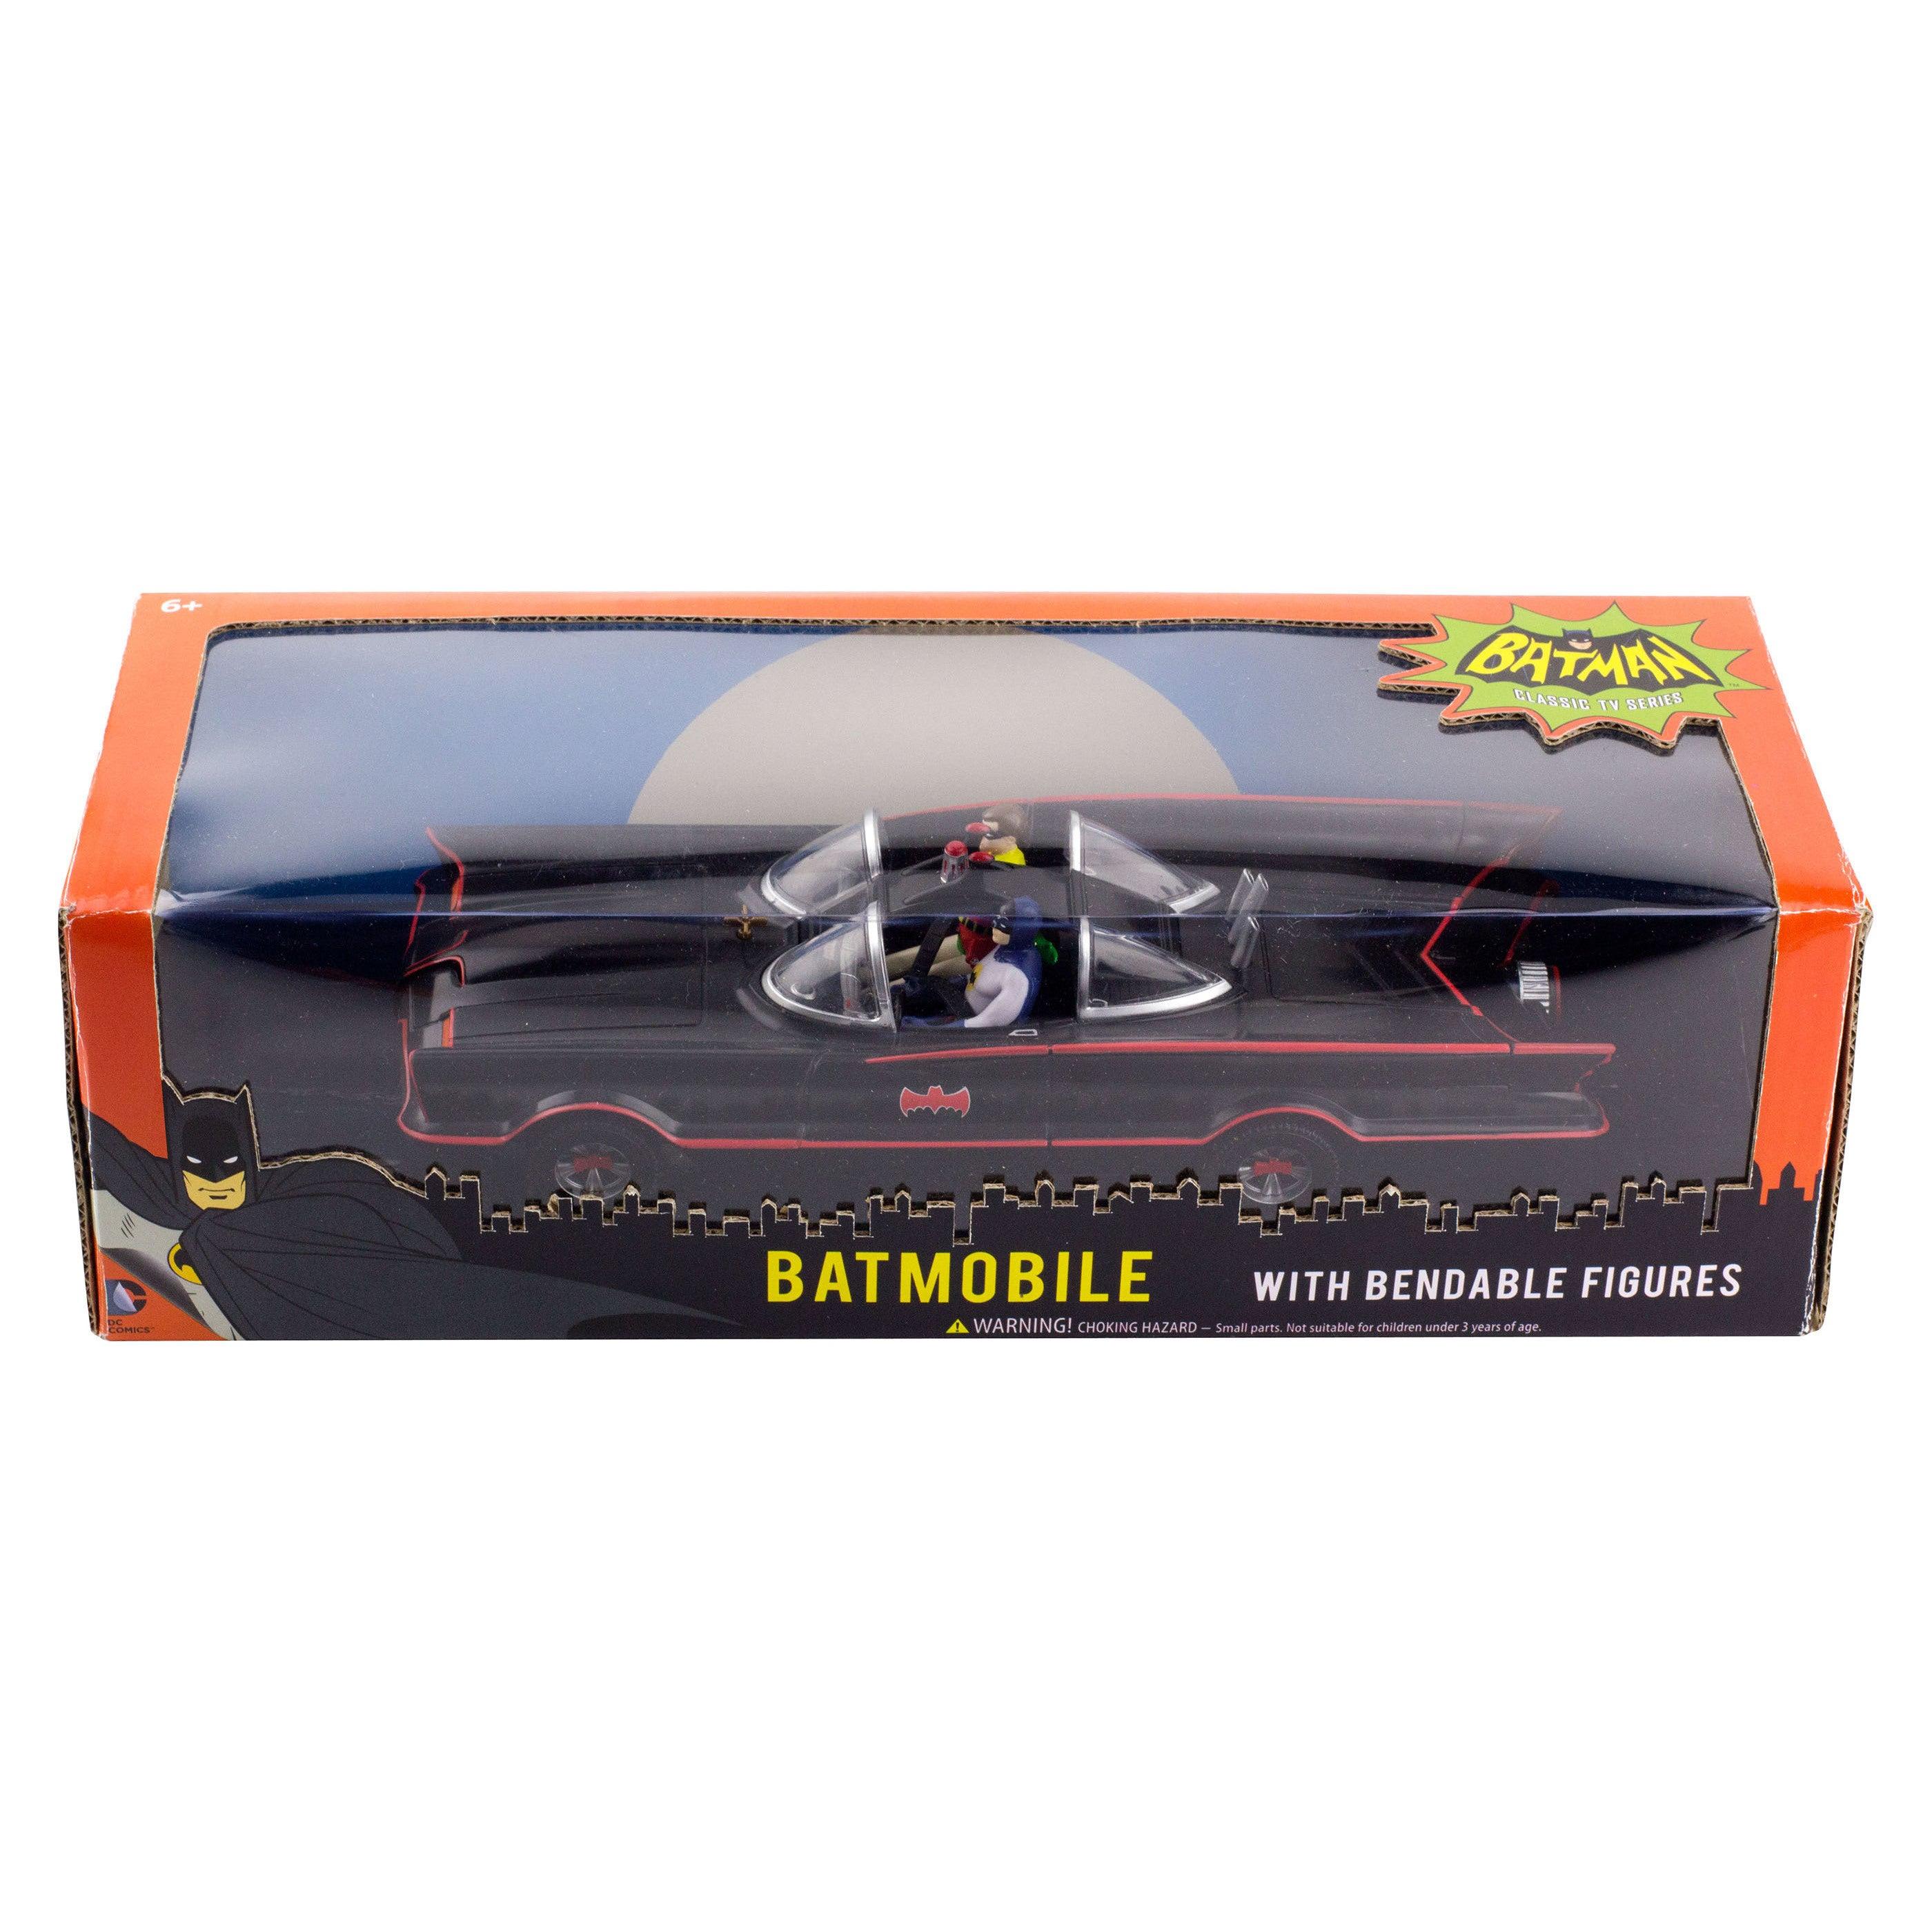 Dc Comics 1966 Batmobile Car w/ Batman & Robin Mini Benda...